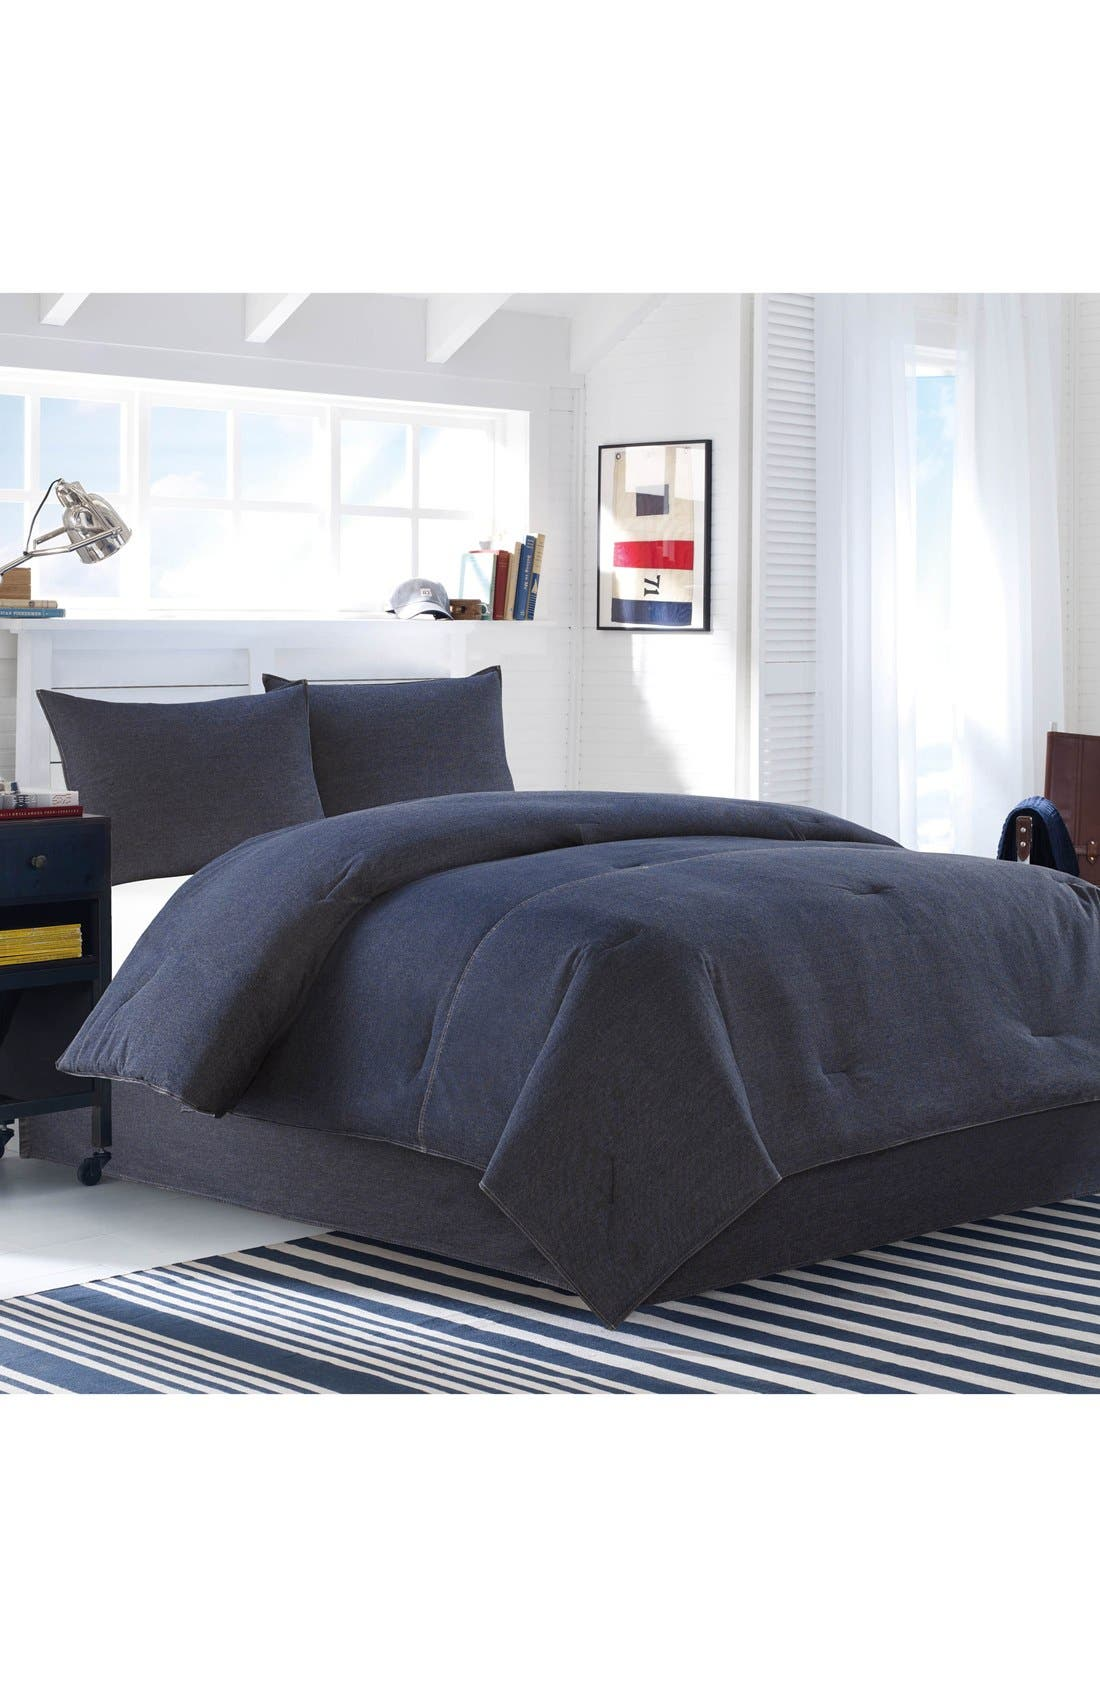 Seaward Comforter & Sham Set,                             Main thumbnail 1, color,                             DENIM BLUE